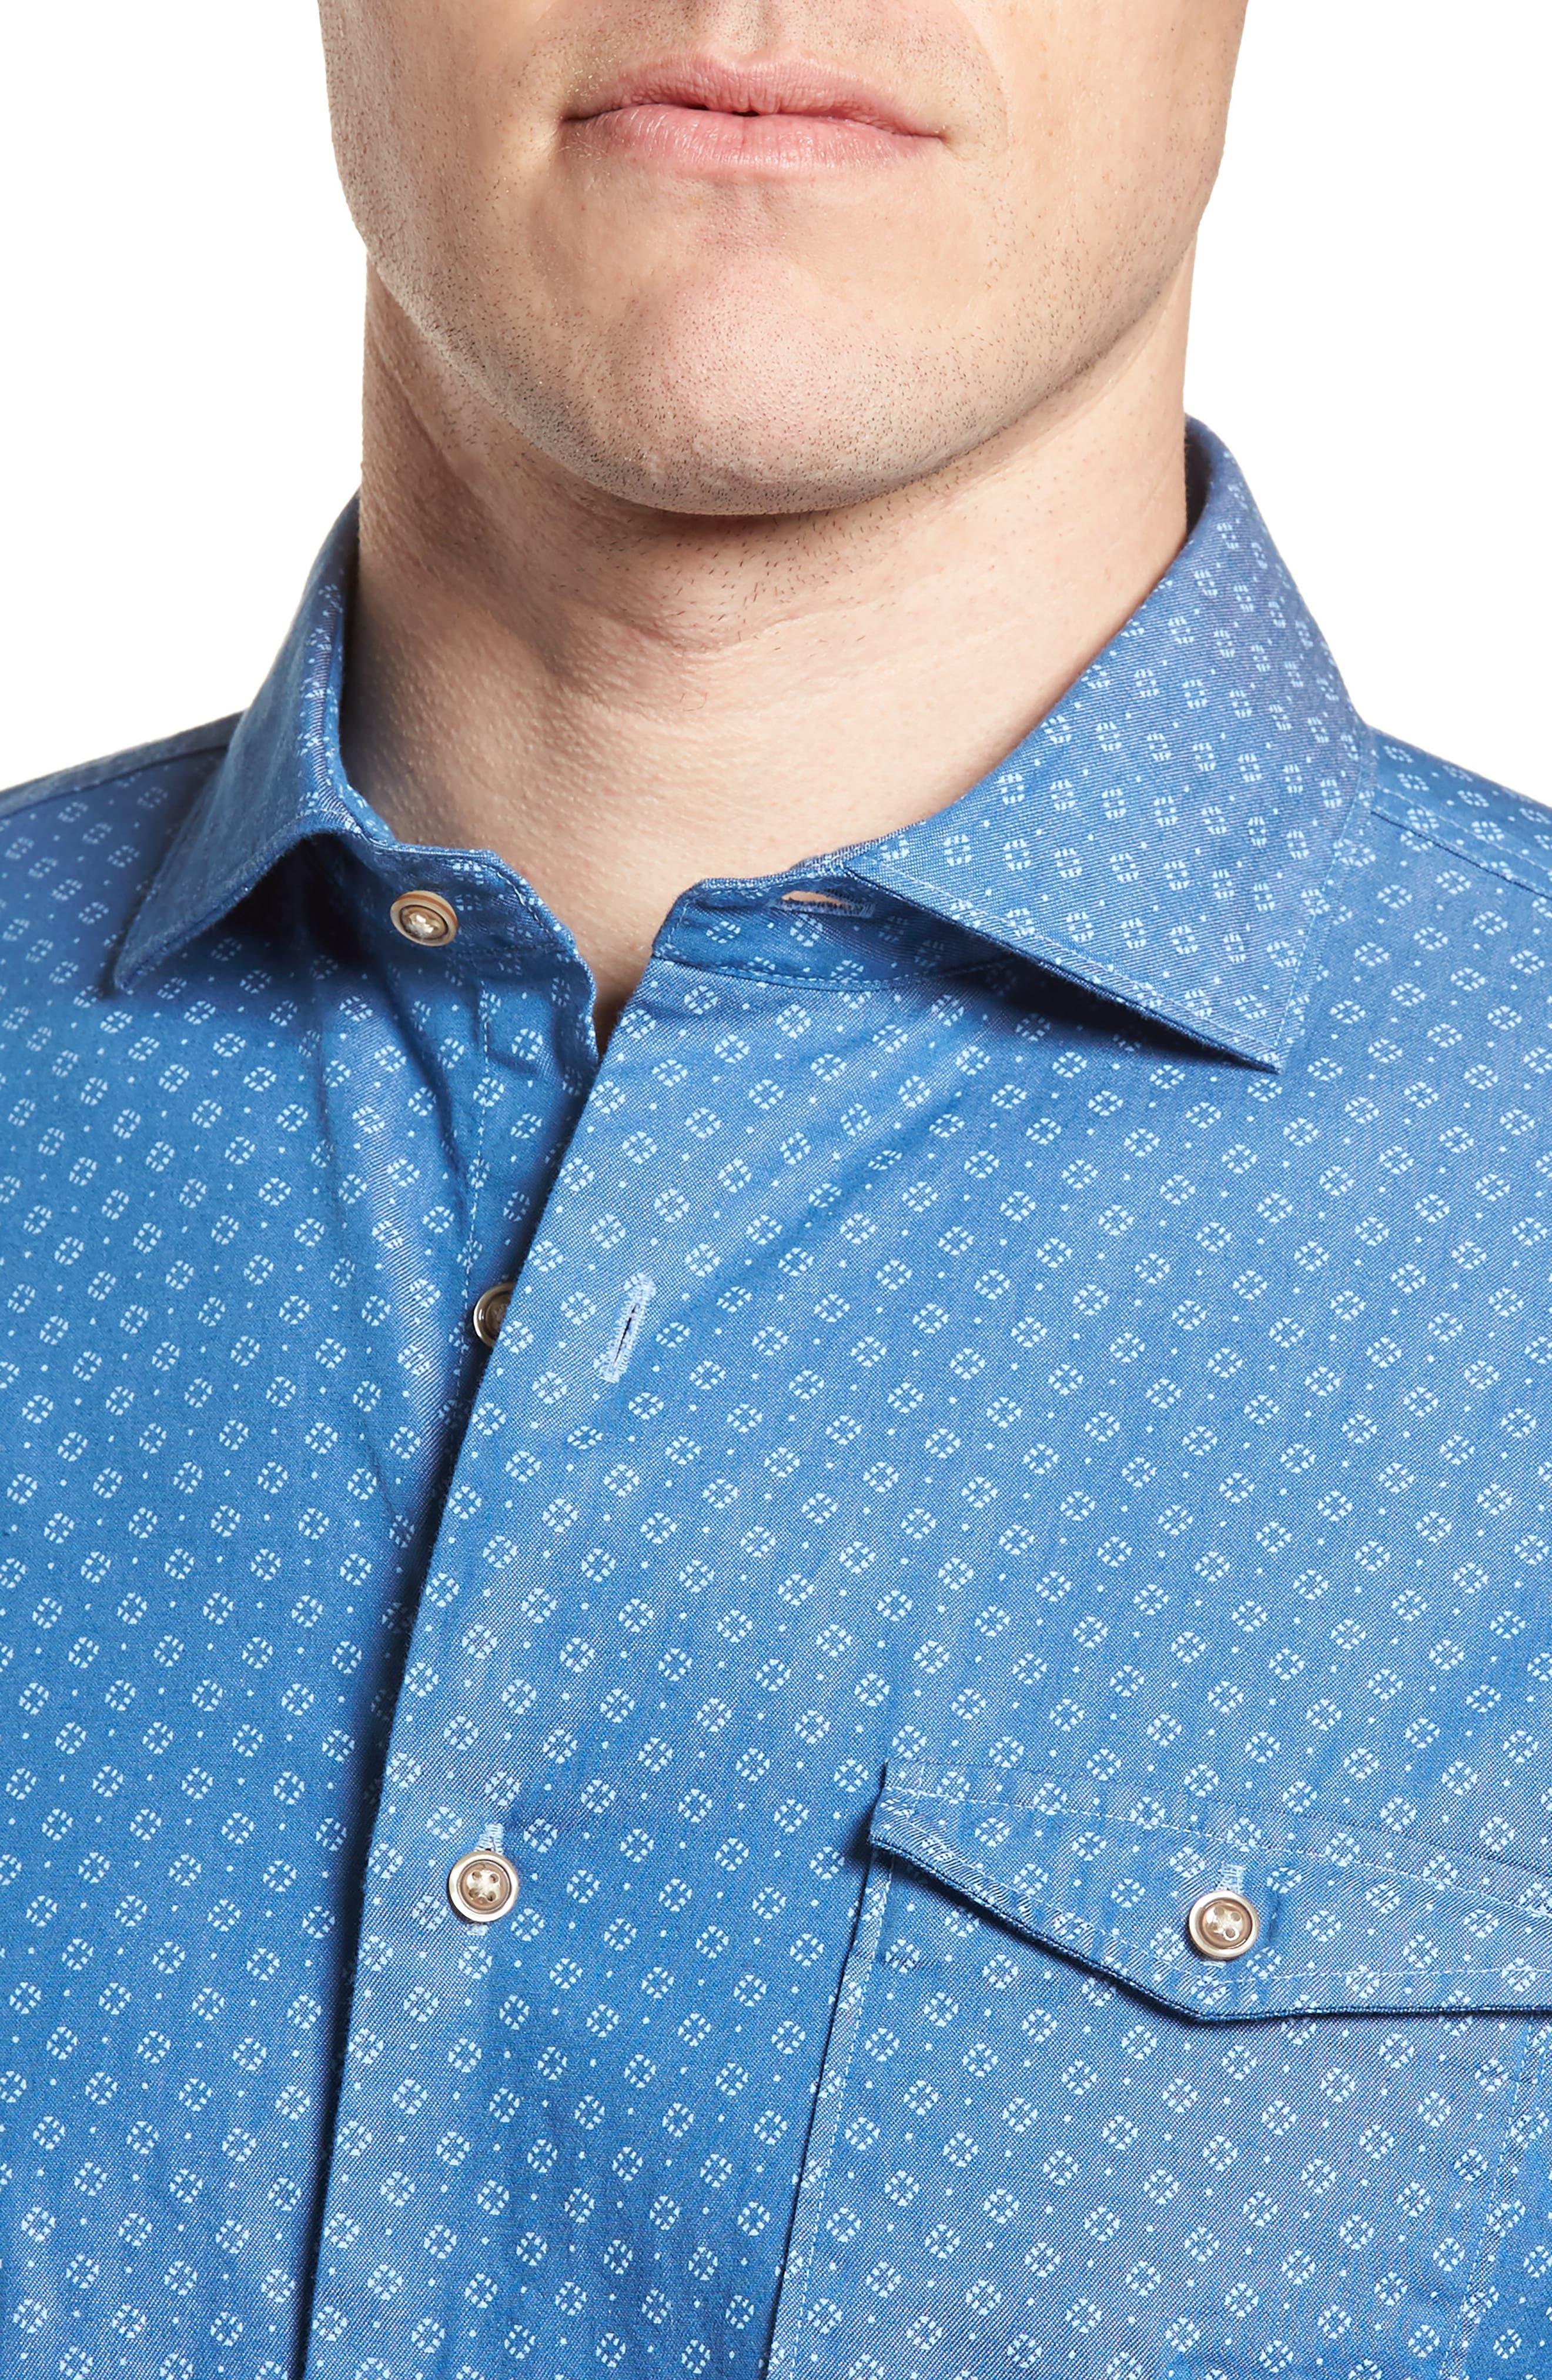 Barclay Regular Fit Sport Shirt,                             Alternate thumbnail 4, color,                             250